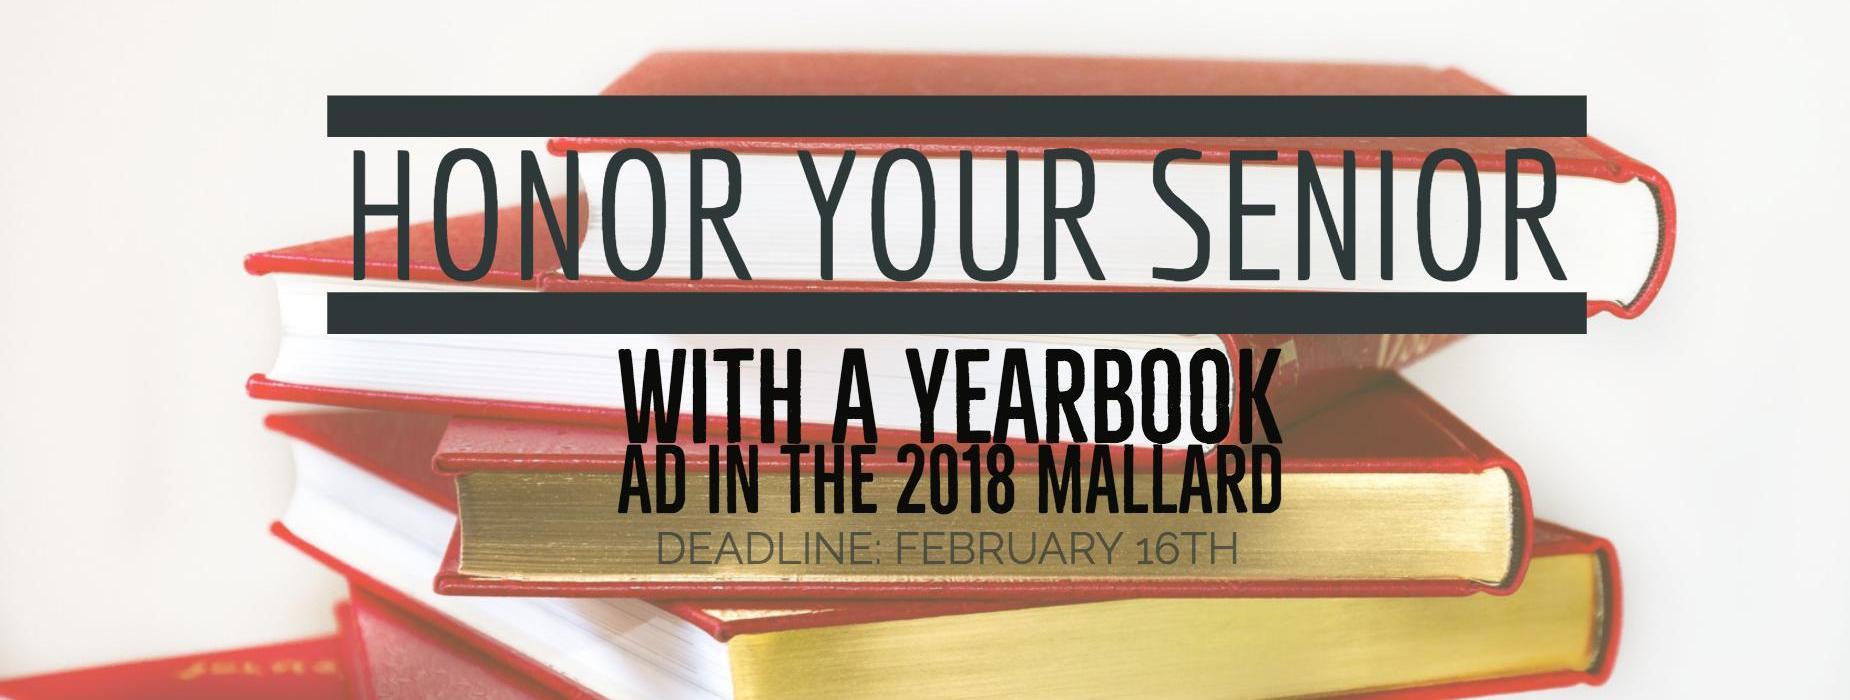 Senior ads yearbook